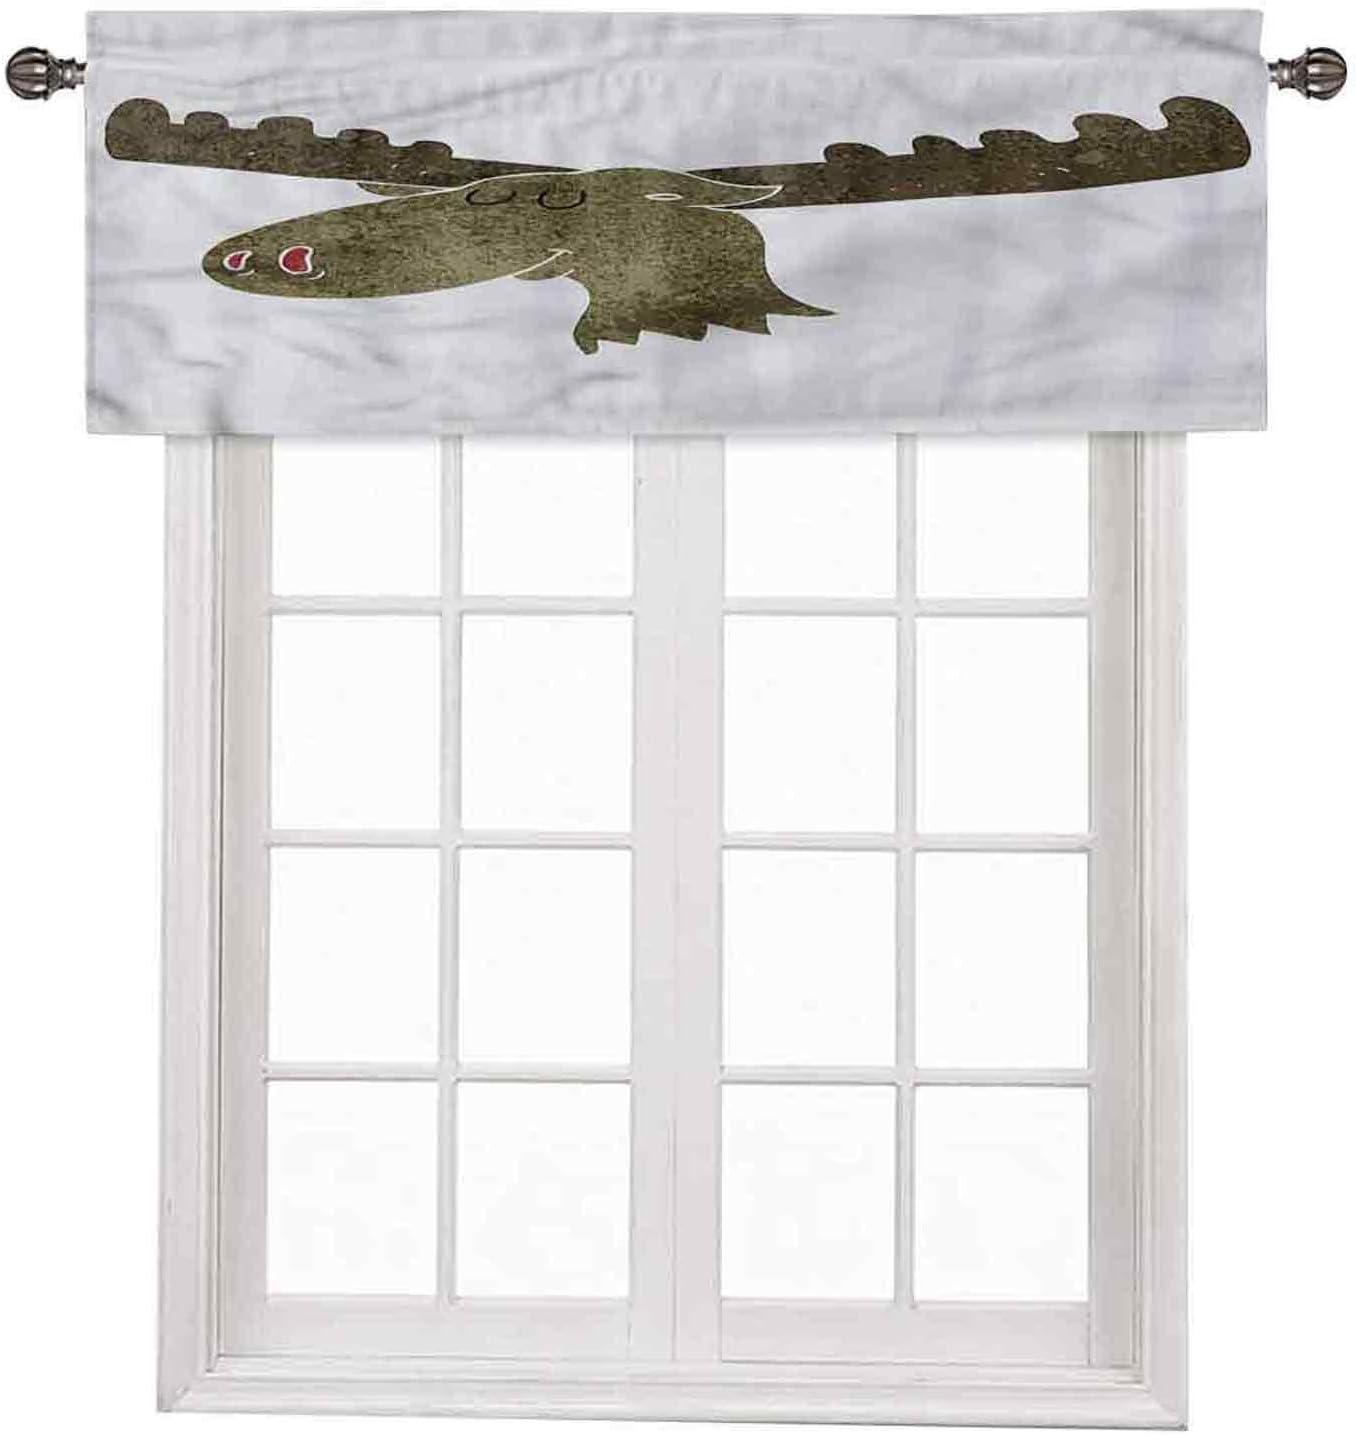 Moose Window Short Curtains Valances Portra Style Animal Super-cheap Max 82% OFF Nursery